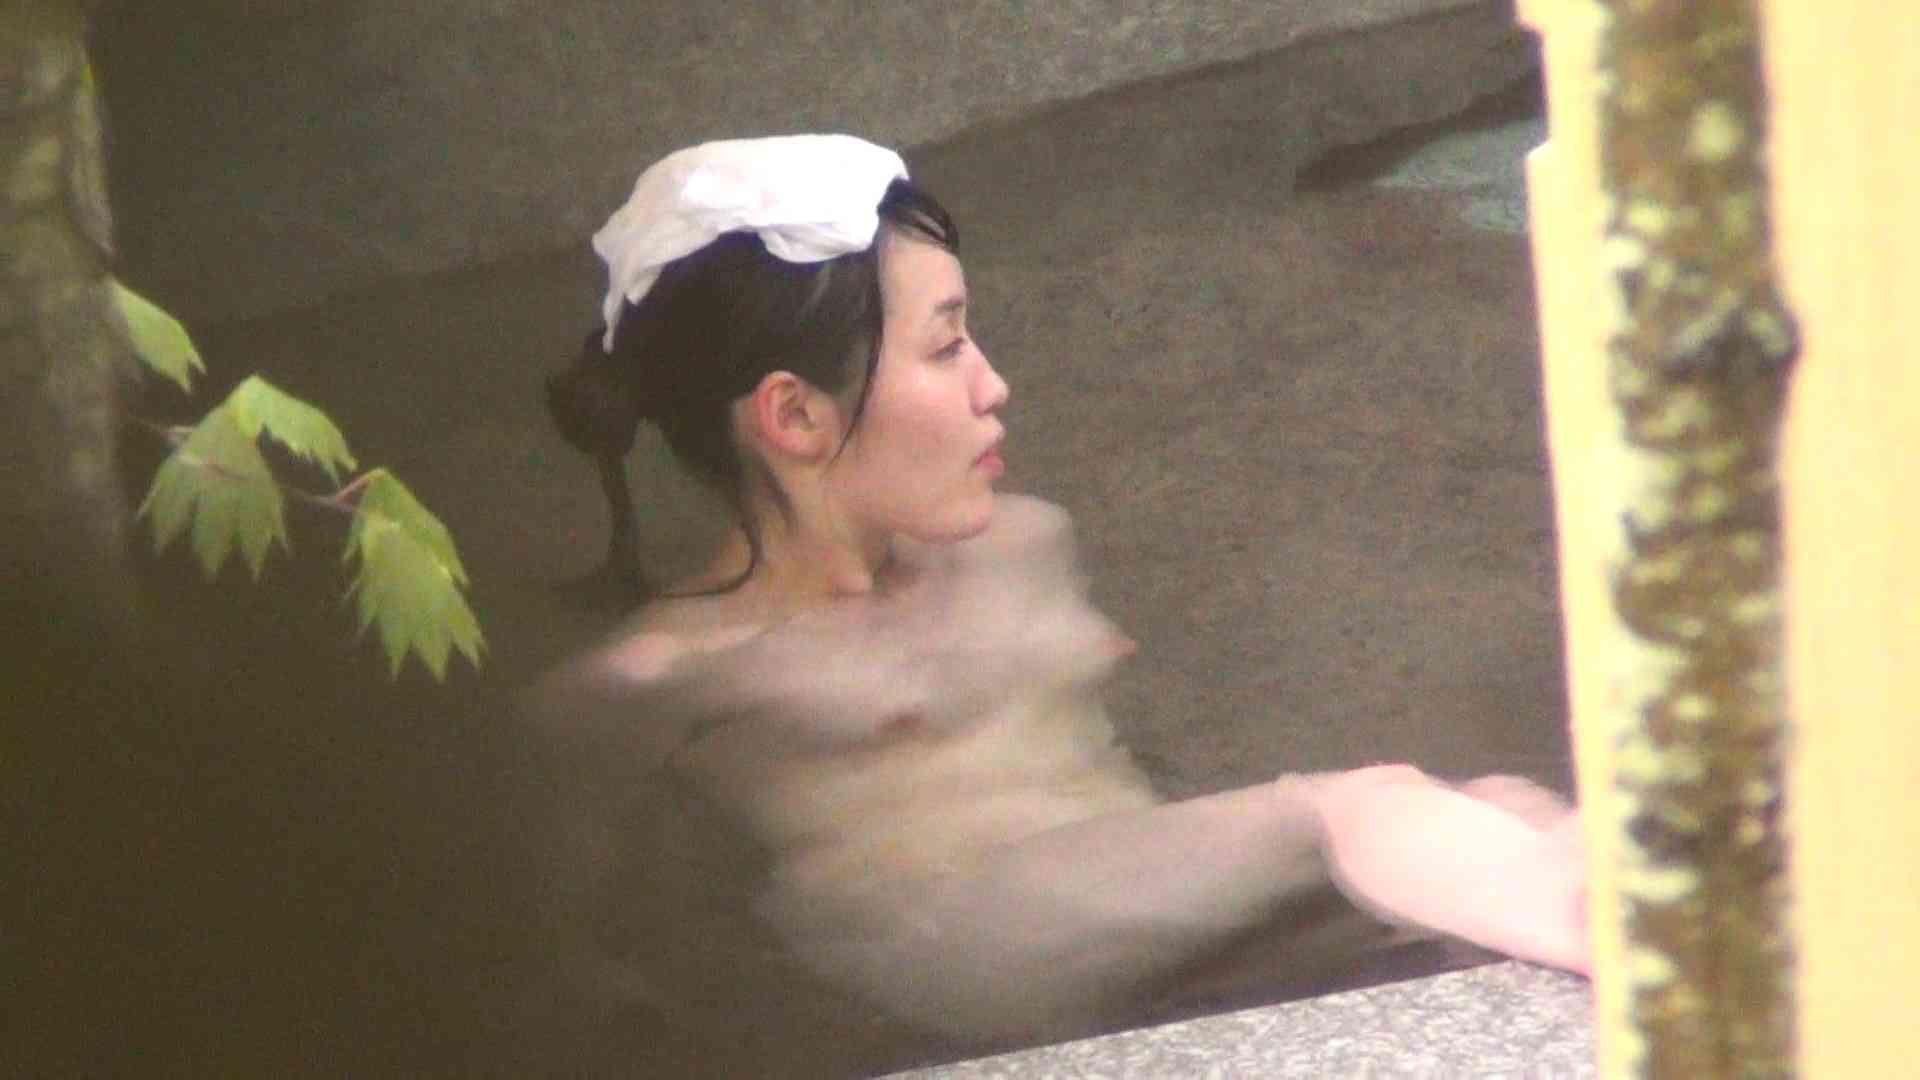 Aquaな露天風呂Vol.235 露天風呂突入 | 盗撮師作品  107pic 103